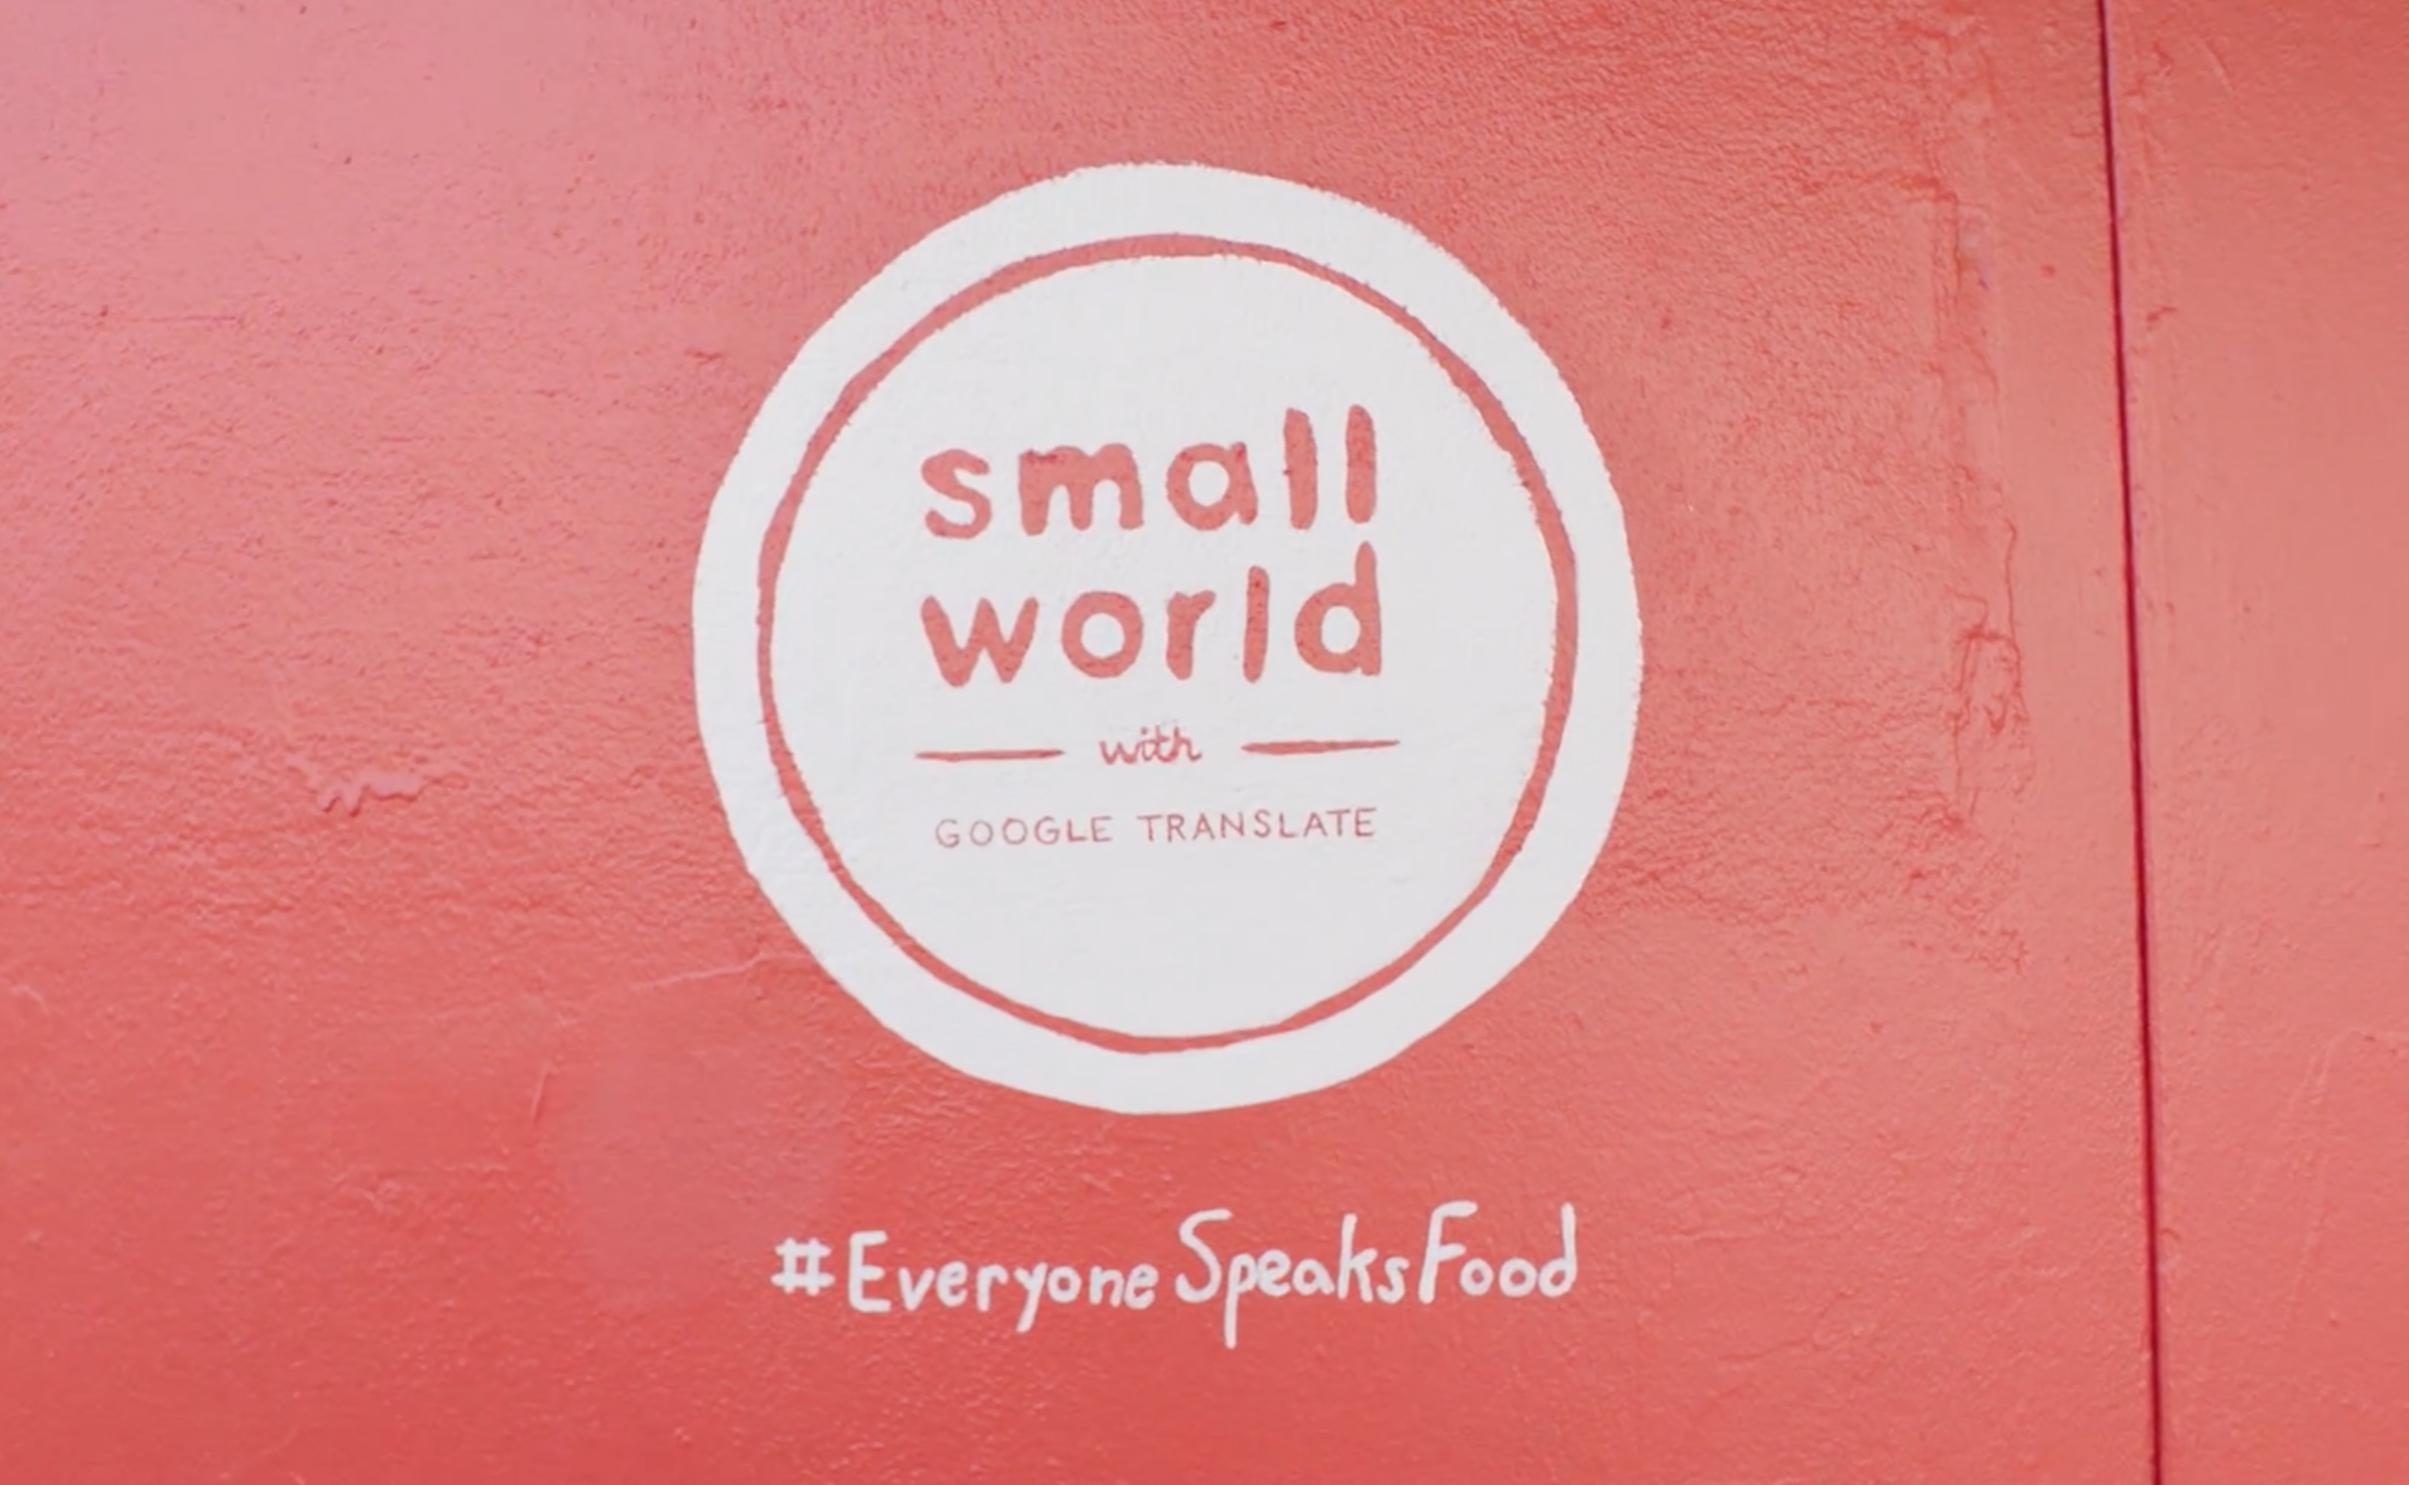 small_world_everyonespeaksfood